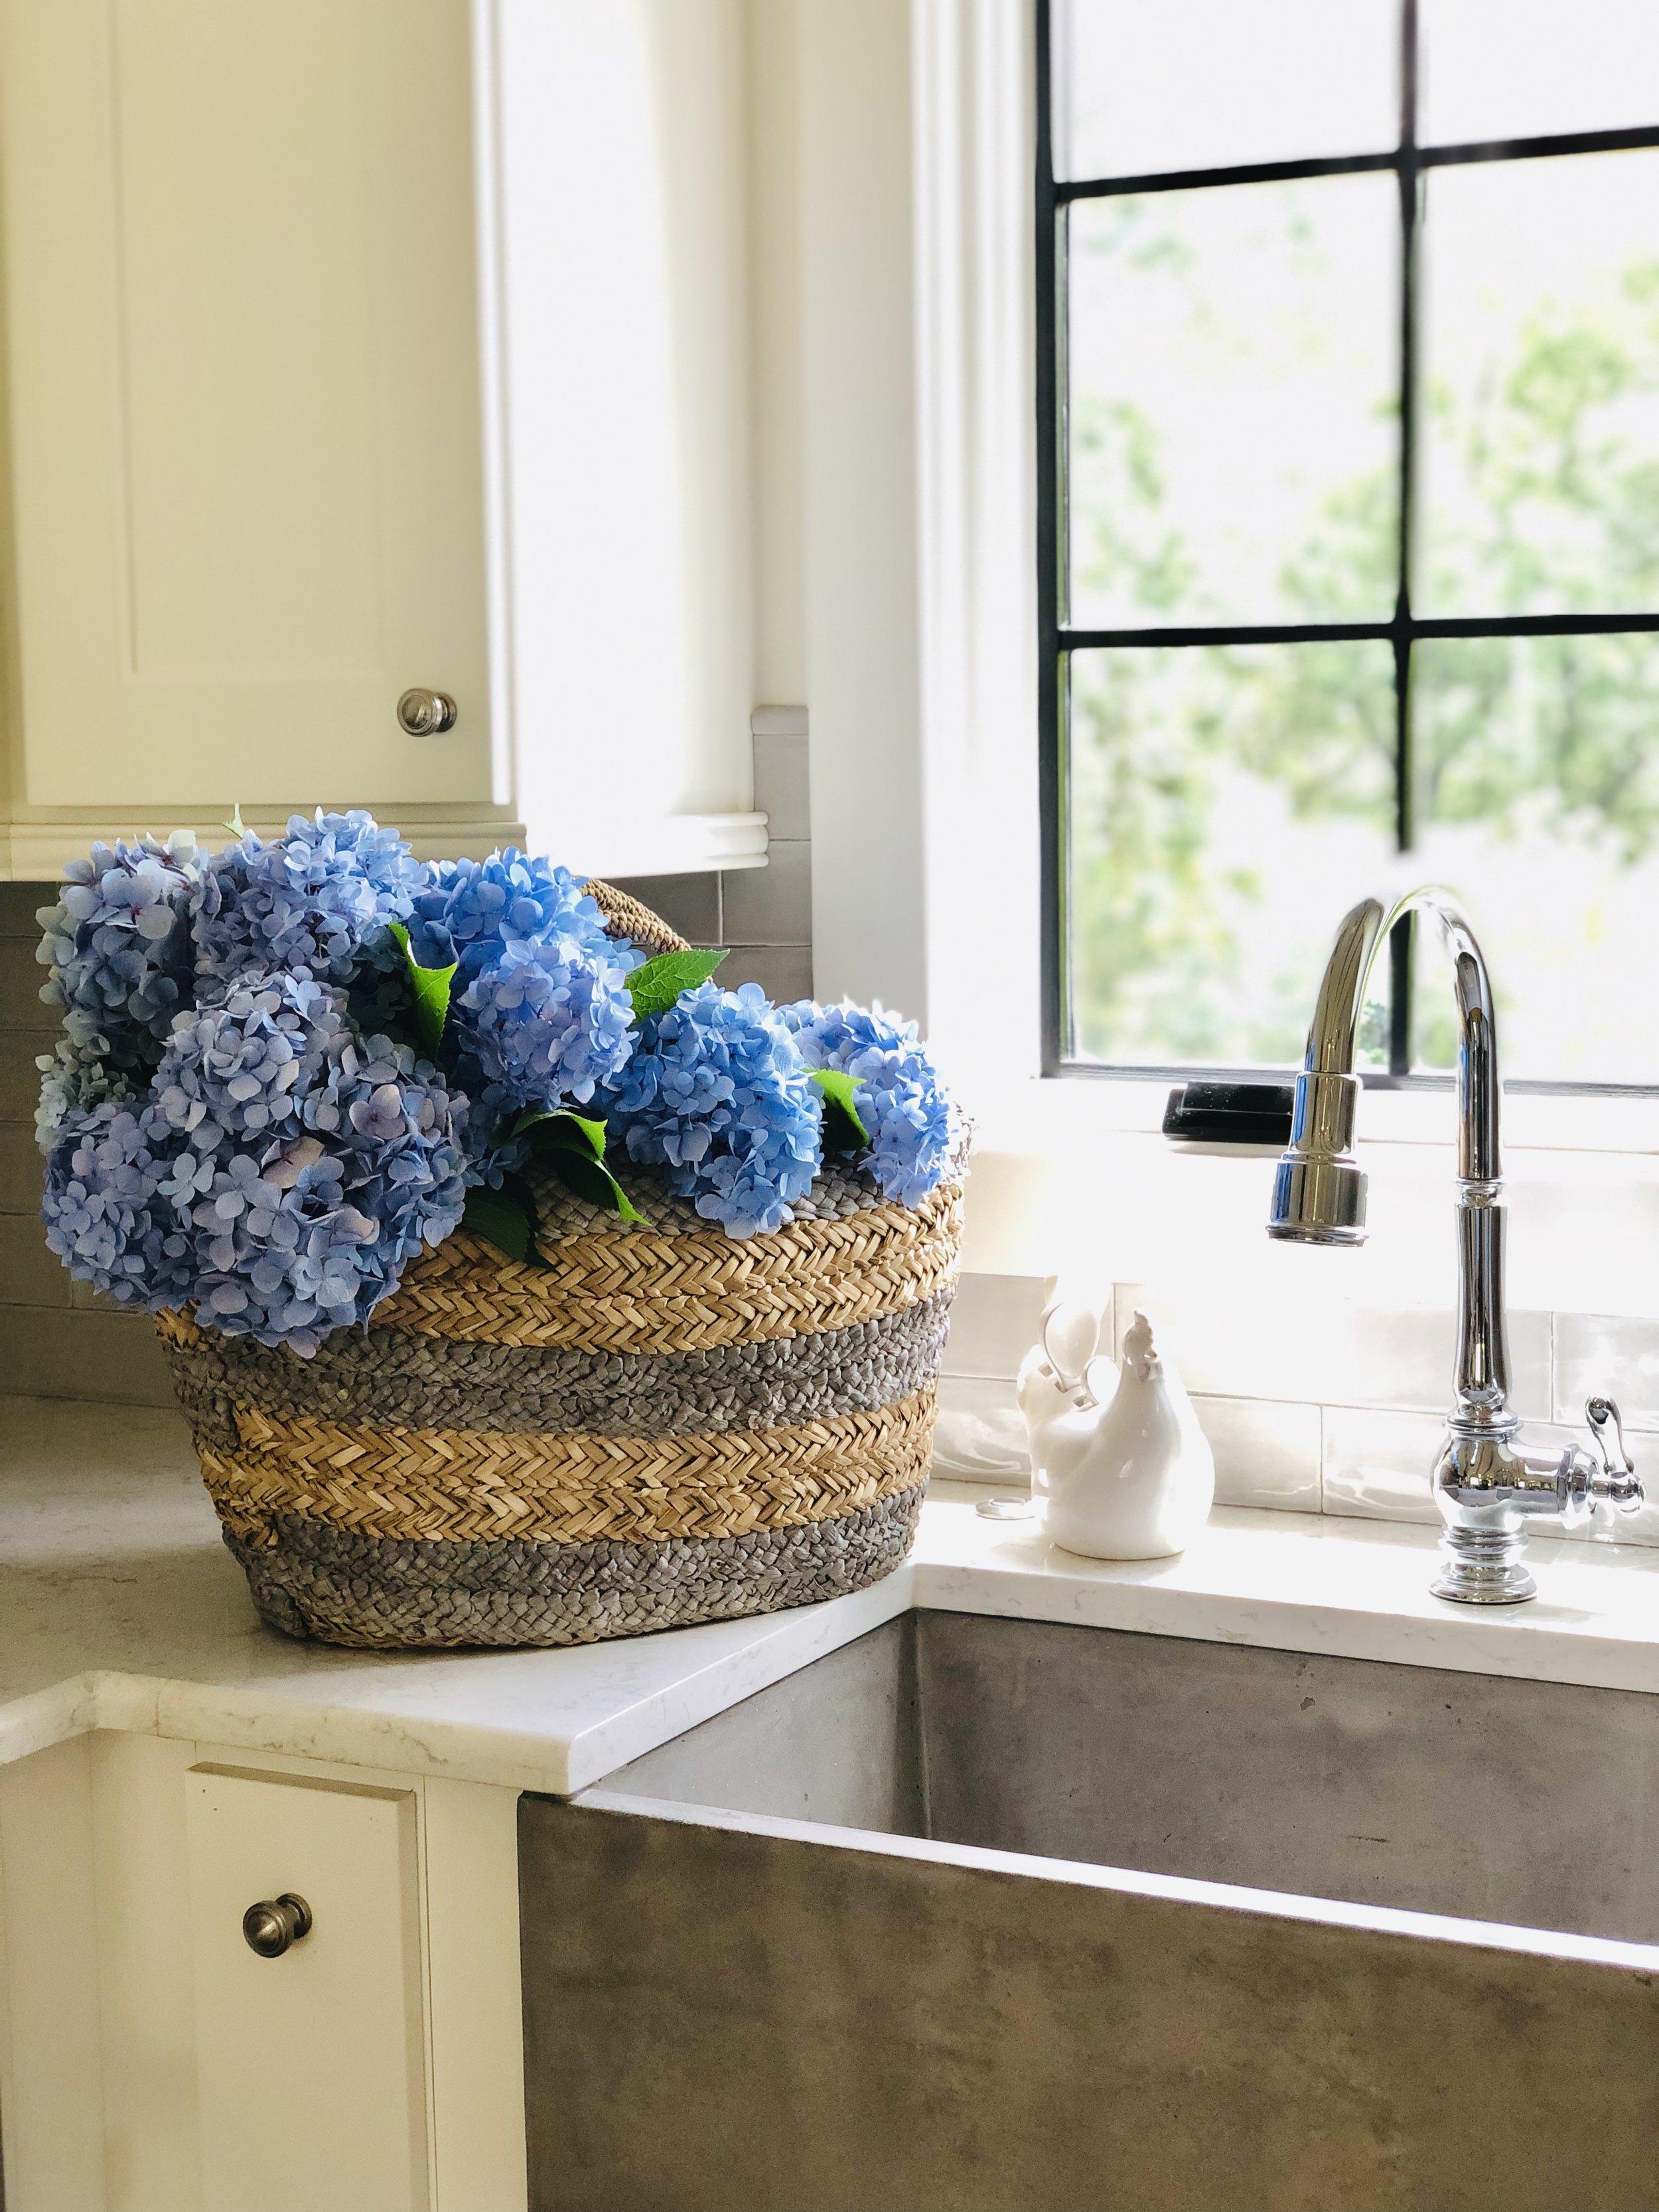 Hydrangea basket.jpg